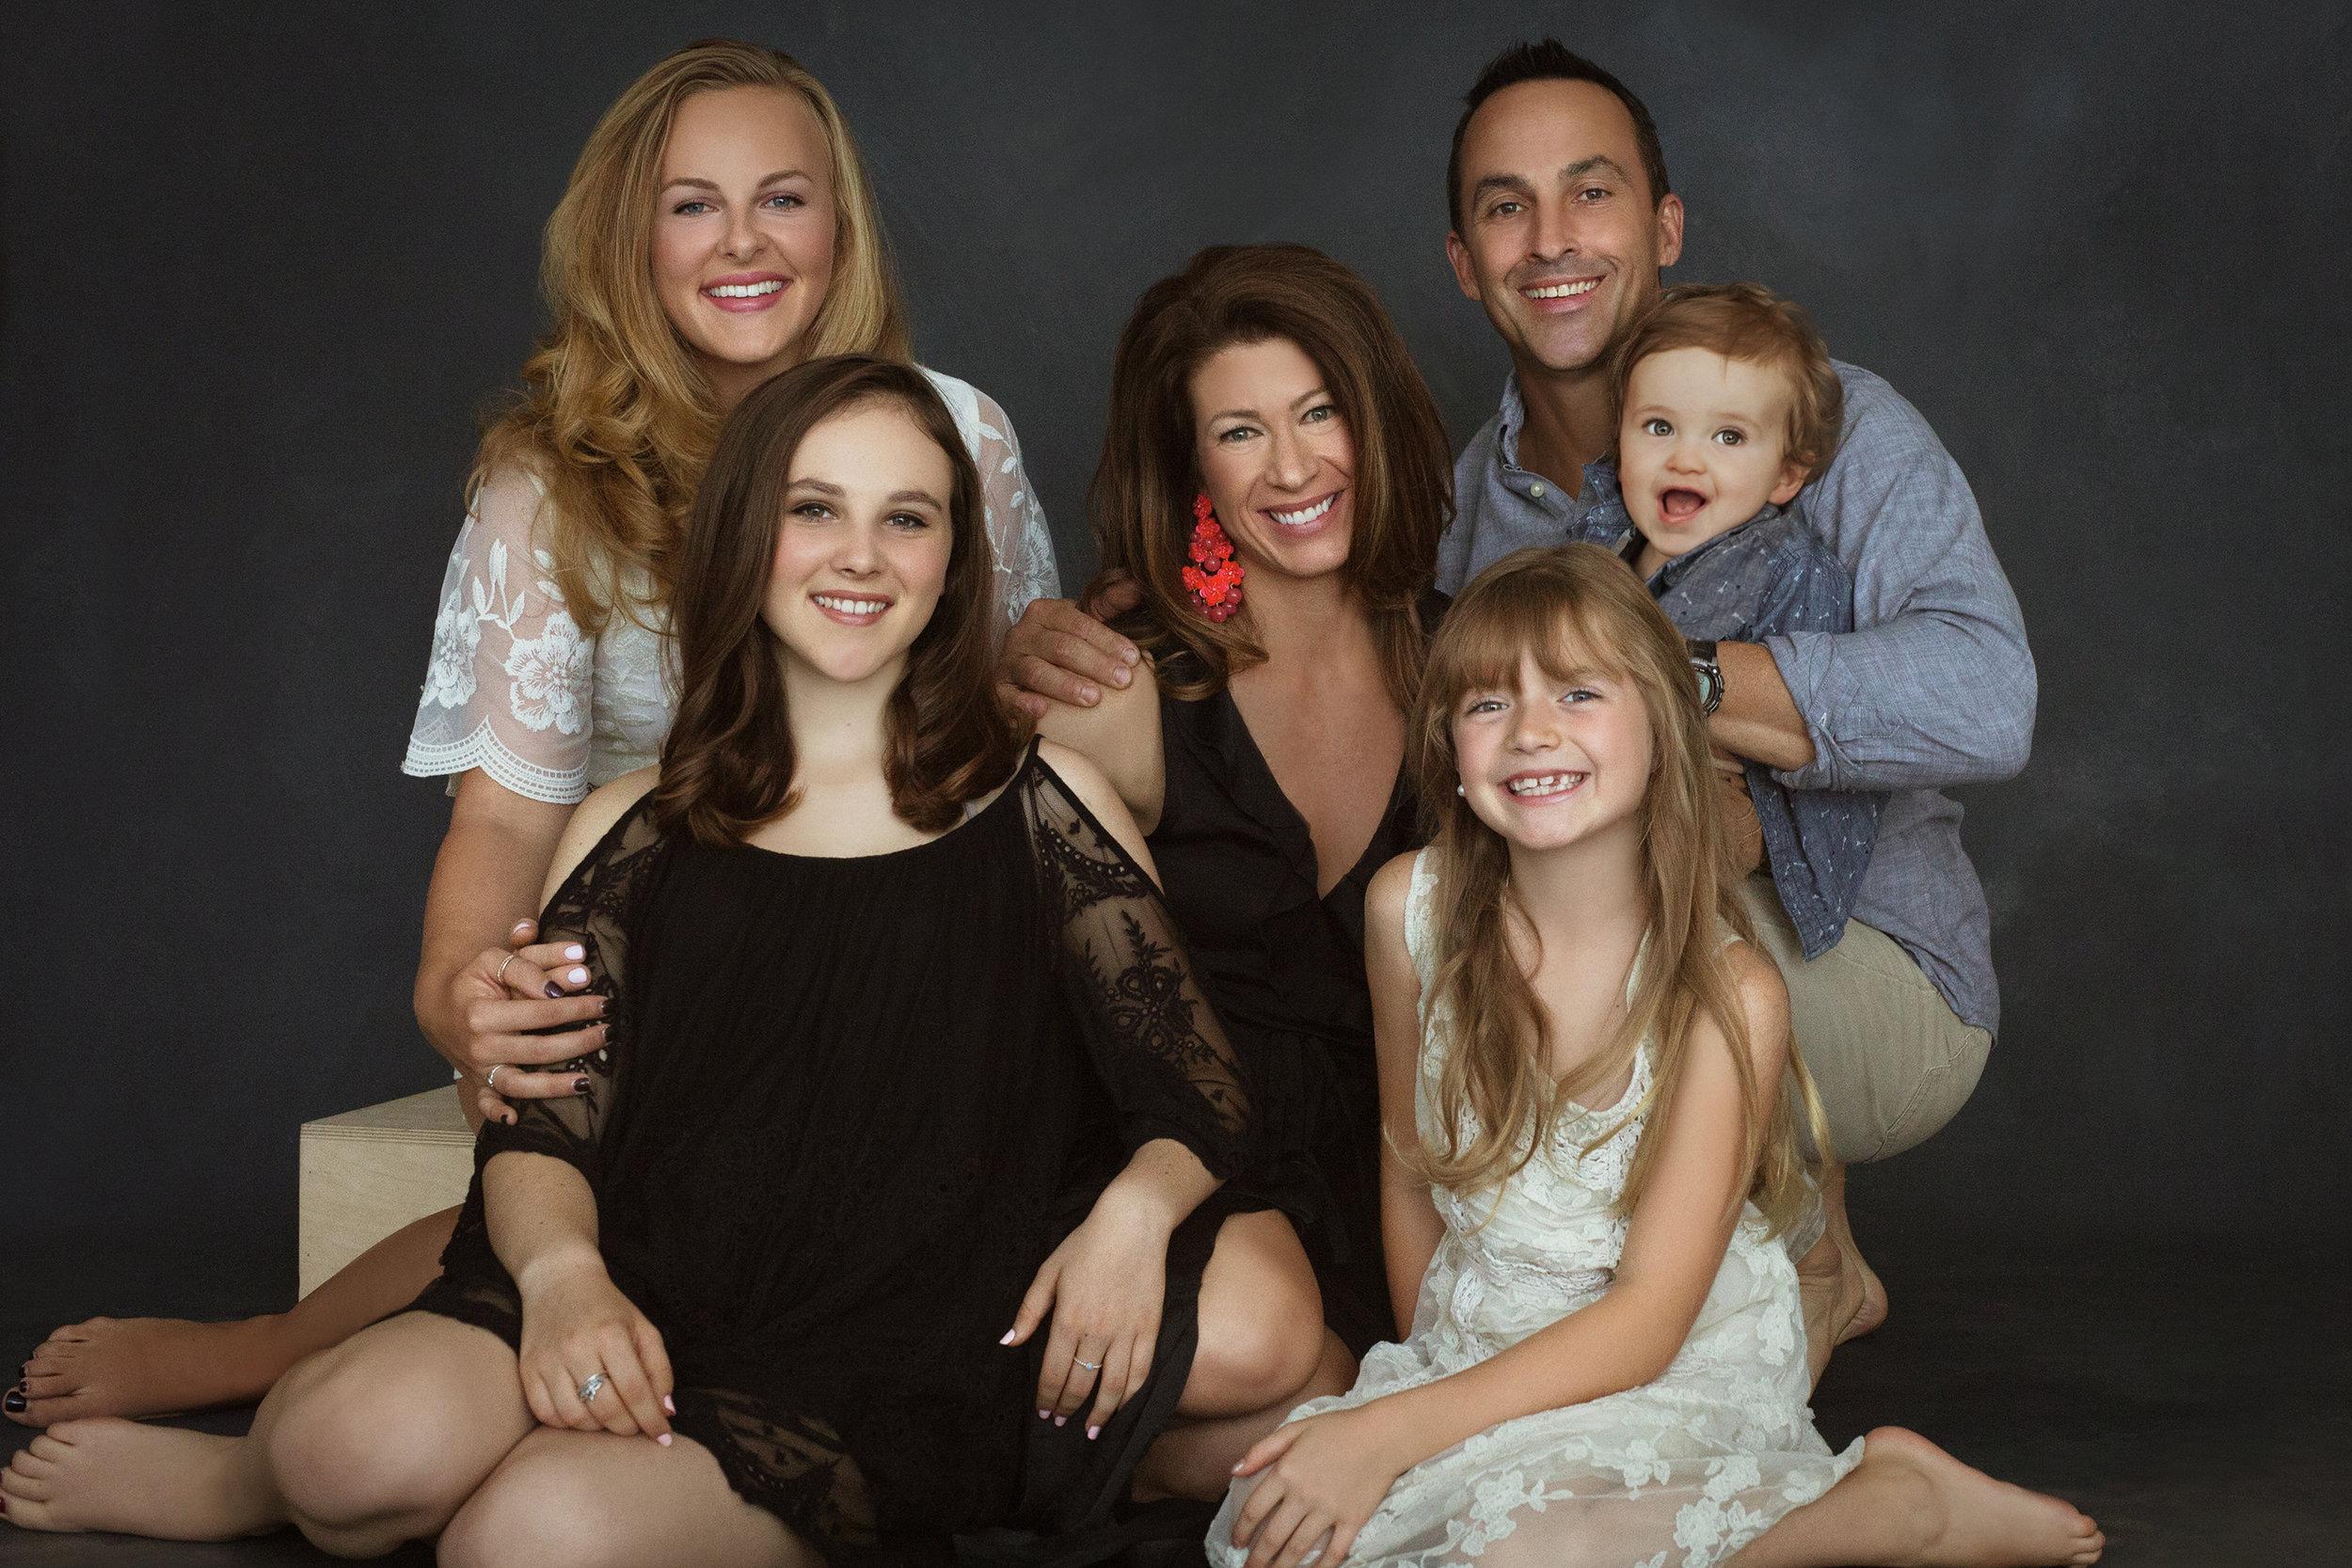 blended family photos - Asheville - Wnc - photo studio - portrait